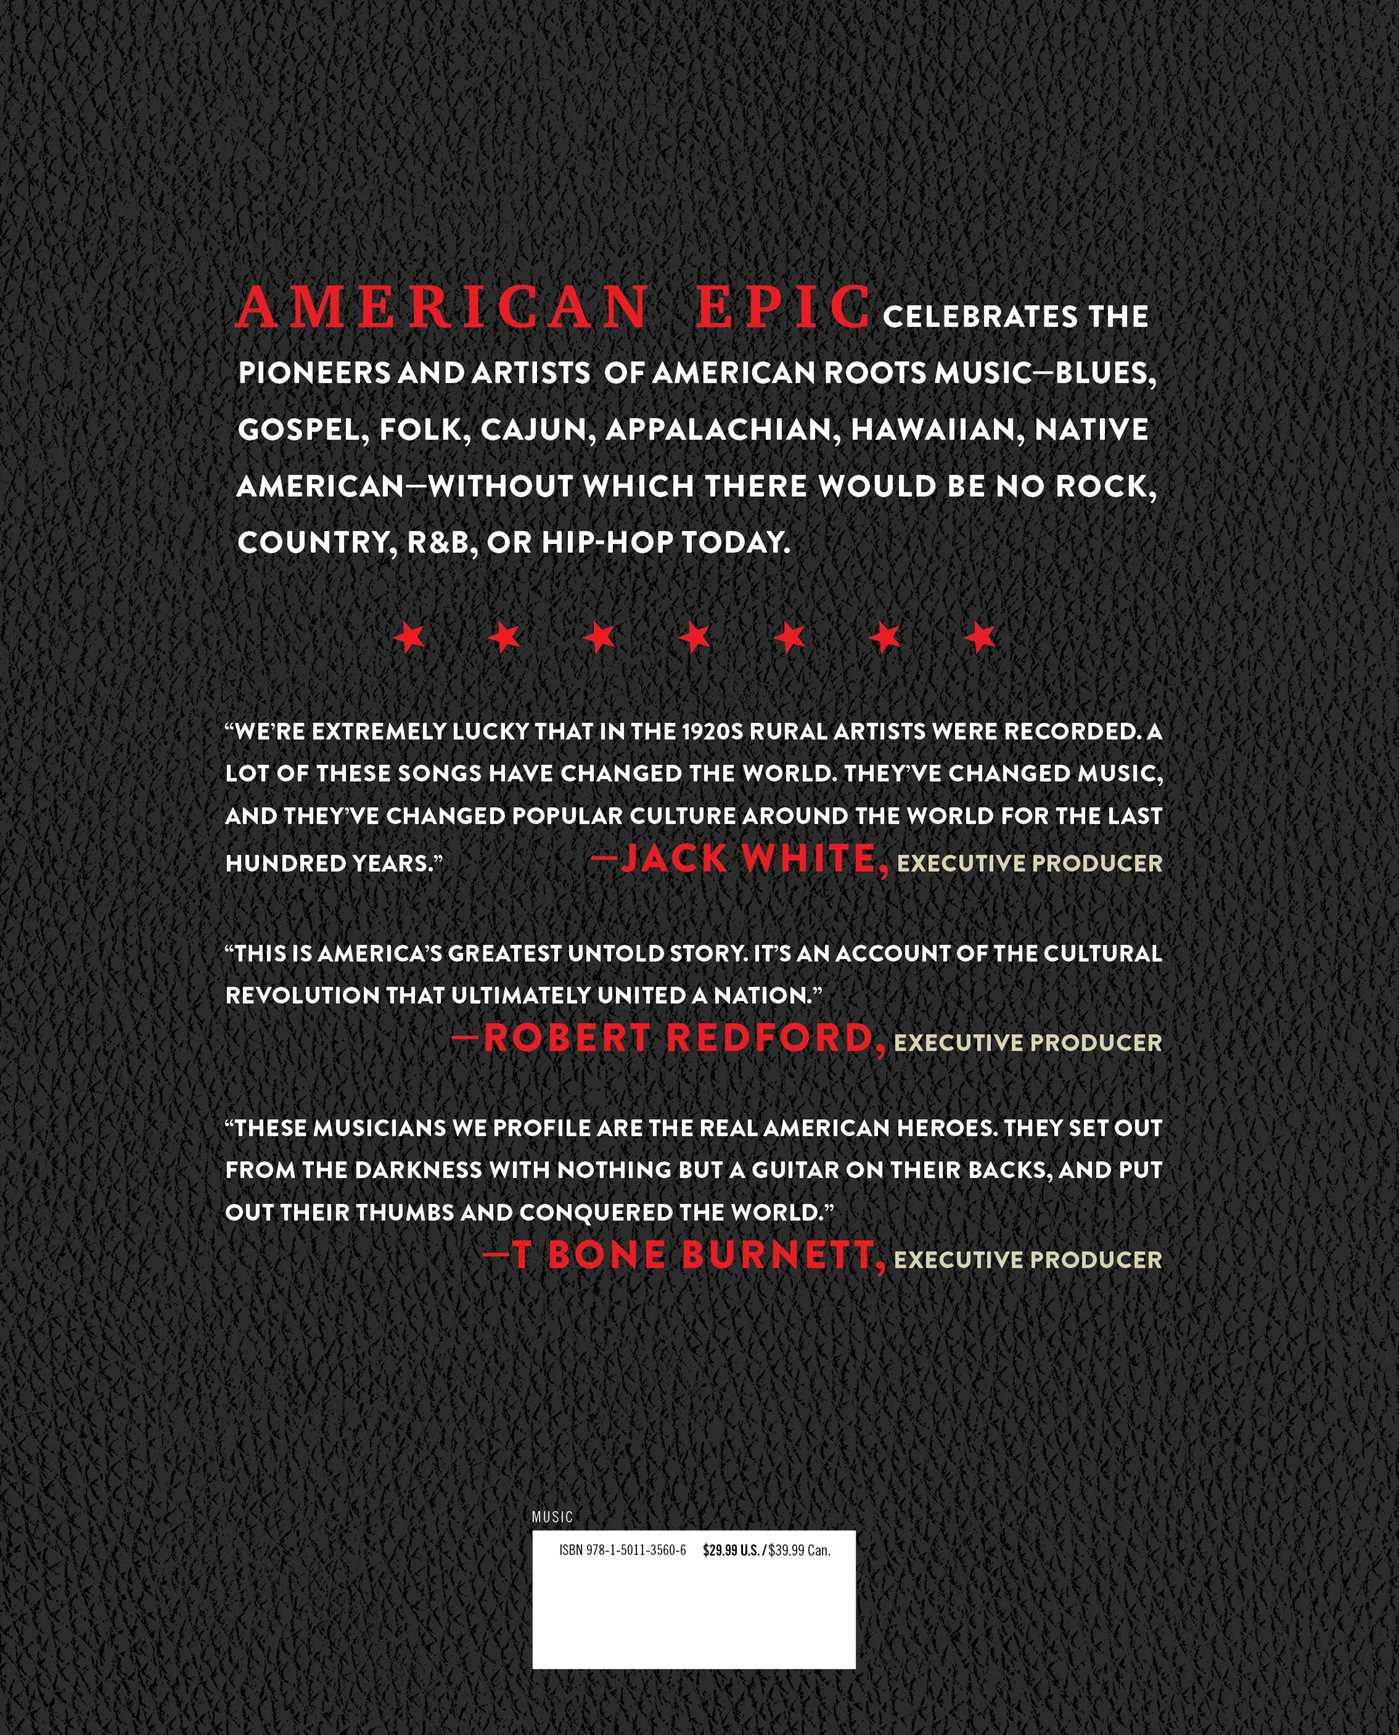 American epic 9781501135606 hr back